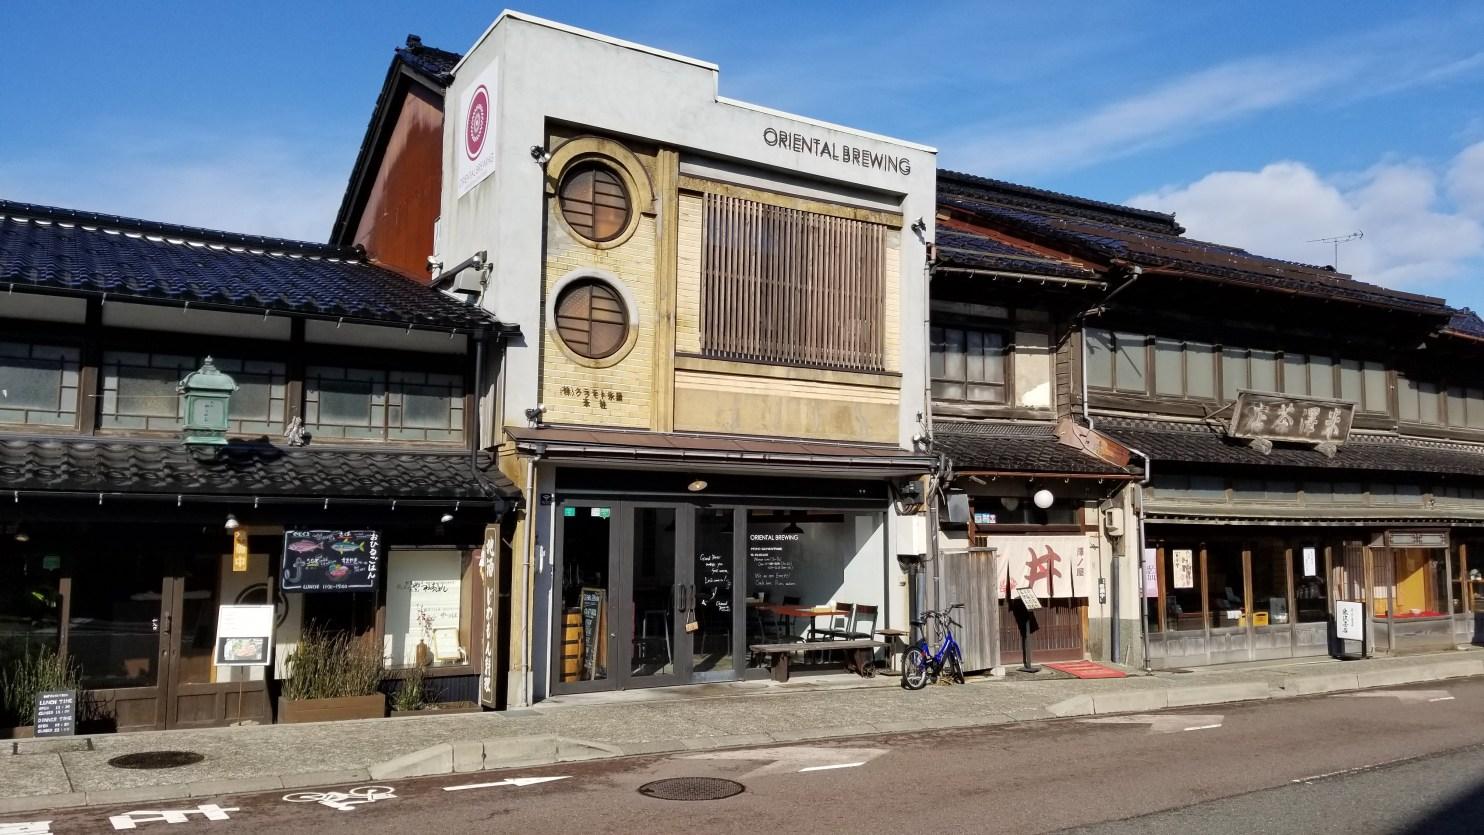 Oriental Brewing Higashiyama Front・オリエンタル ブルーイング東山前